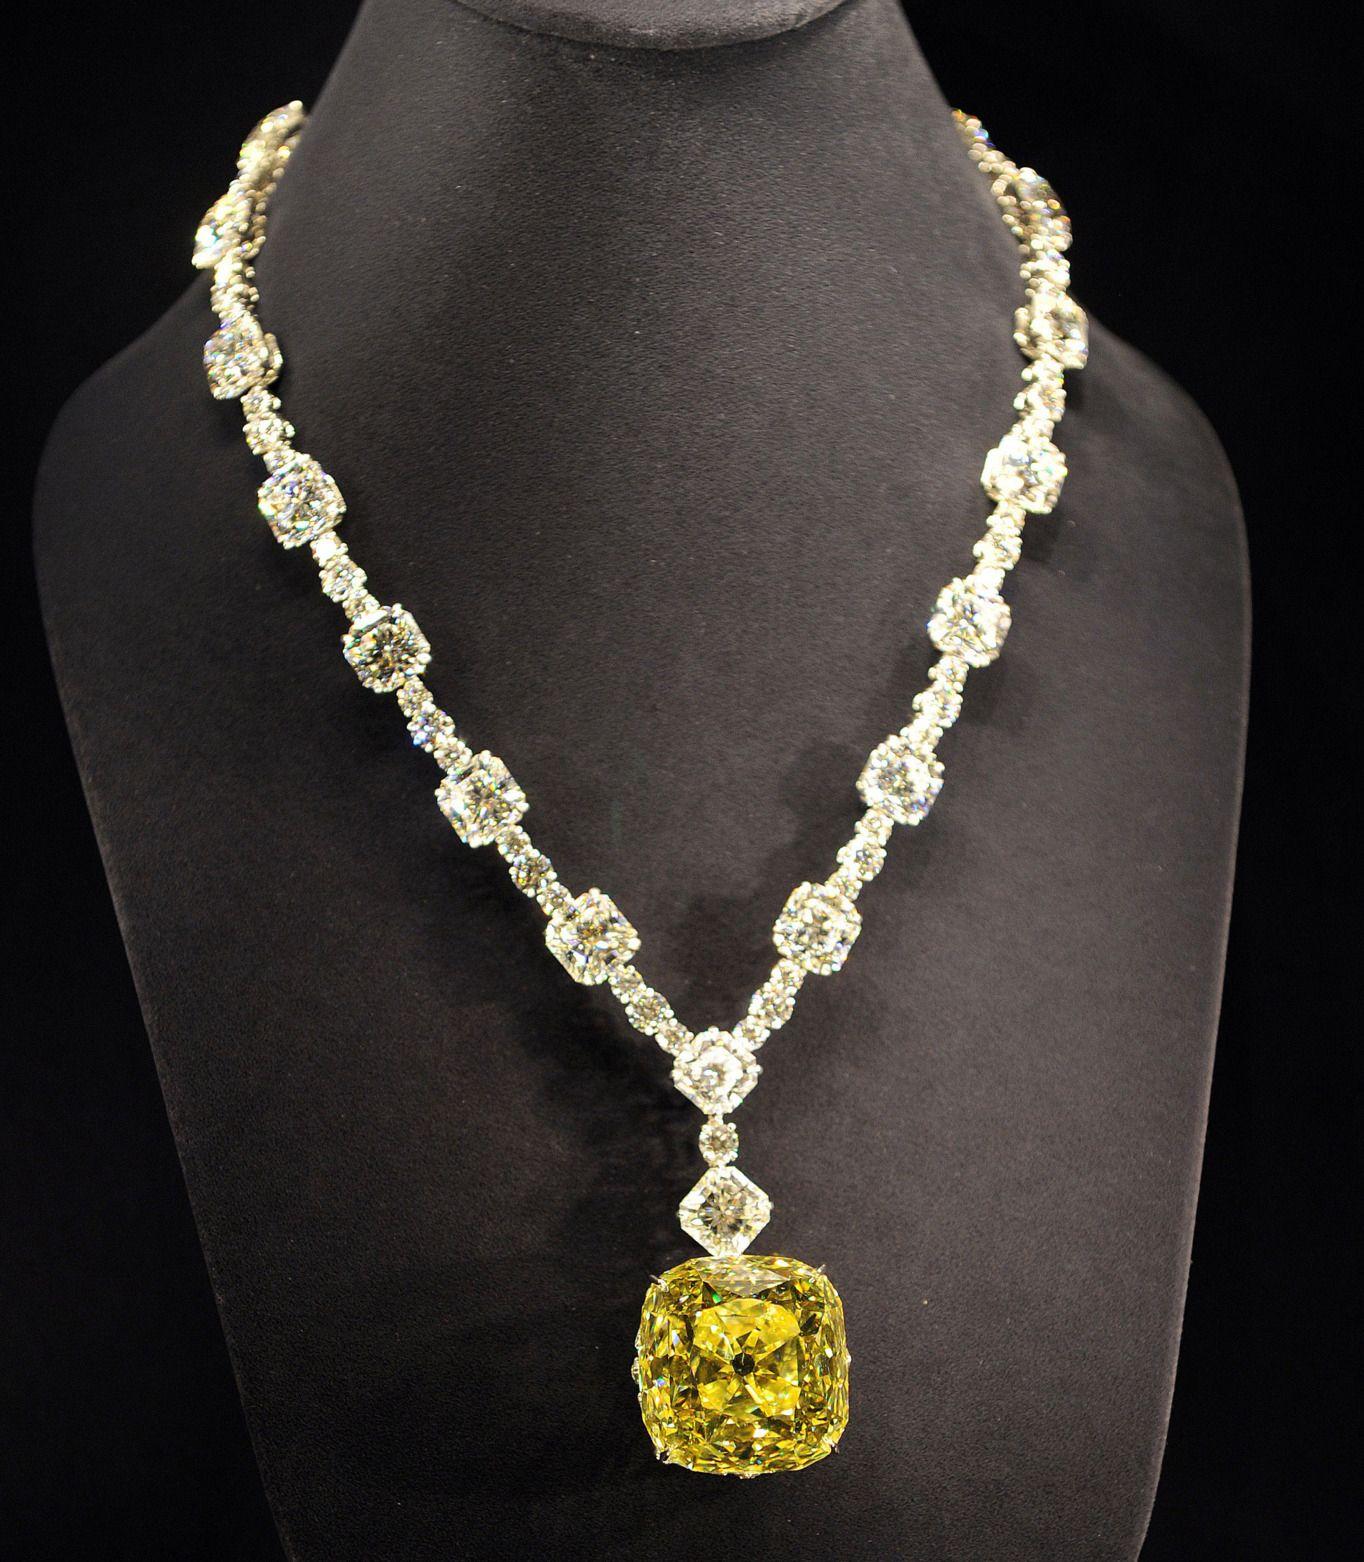 The Tiffany Diamond Necklace The 128 54 Carat Antique